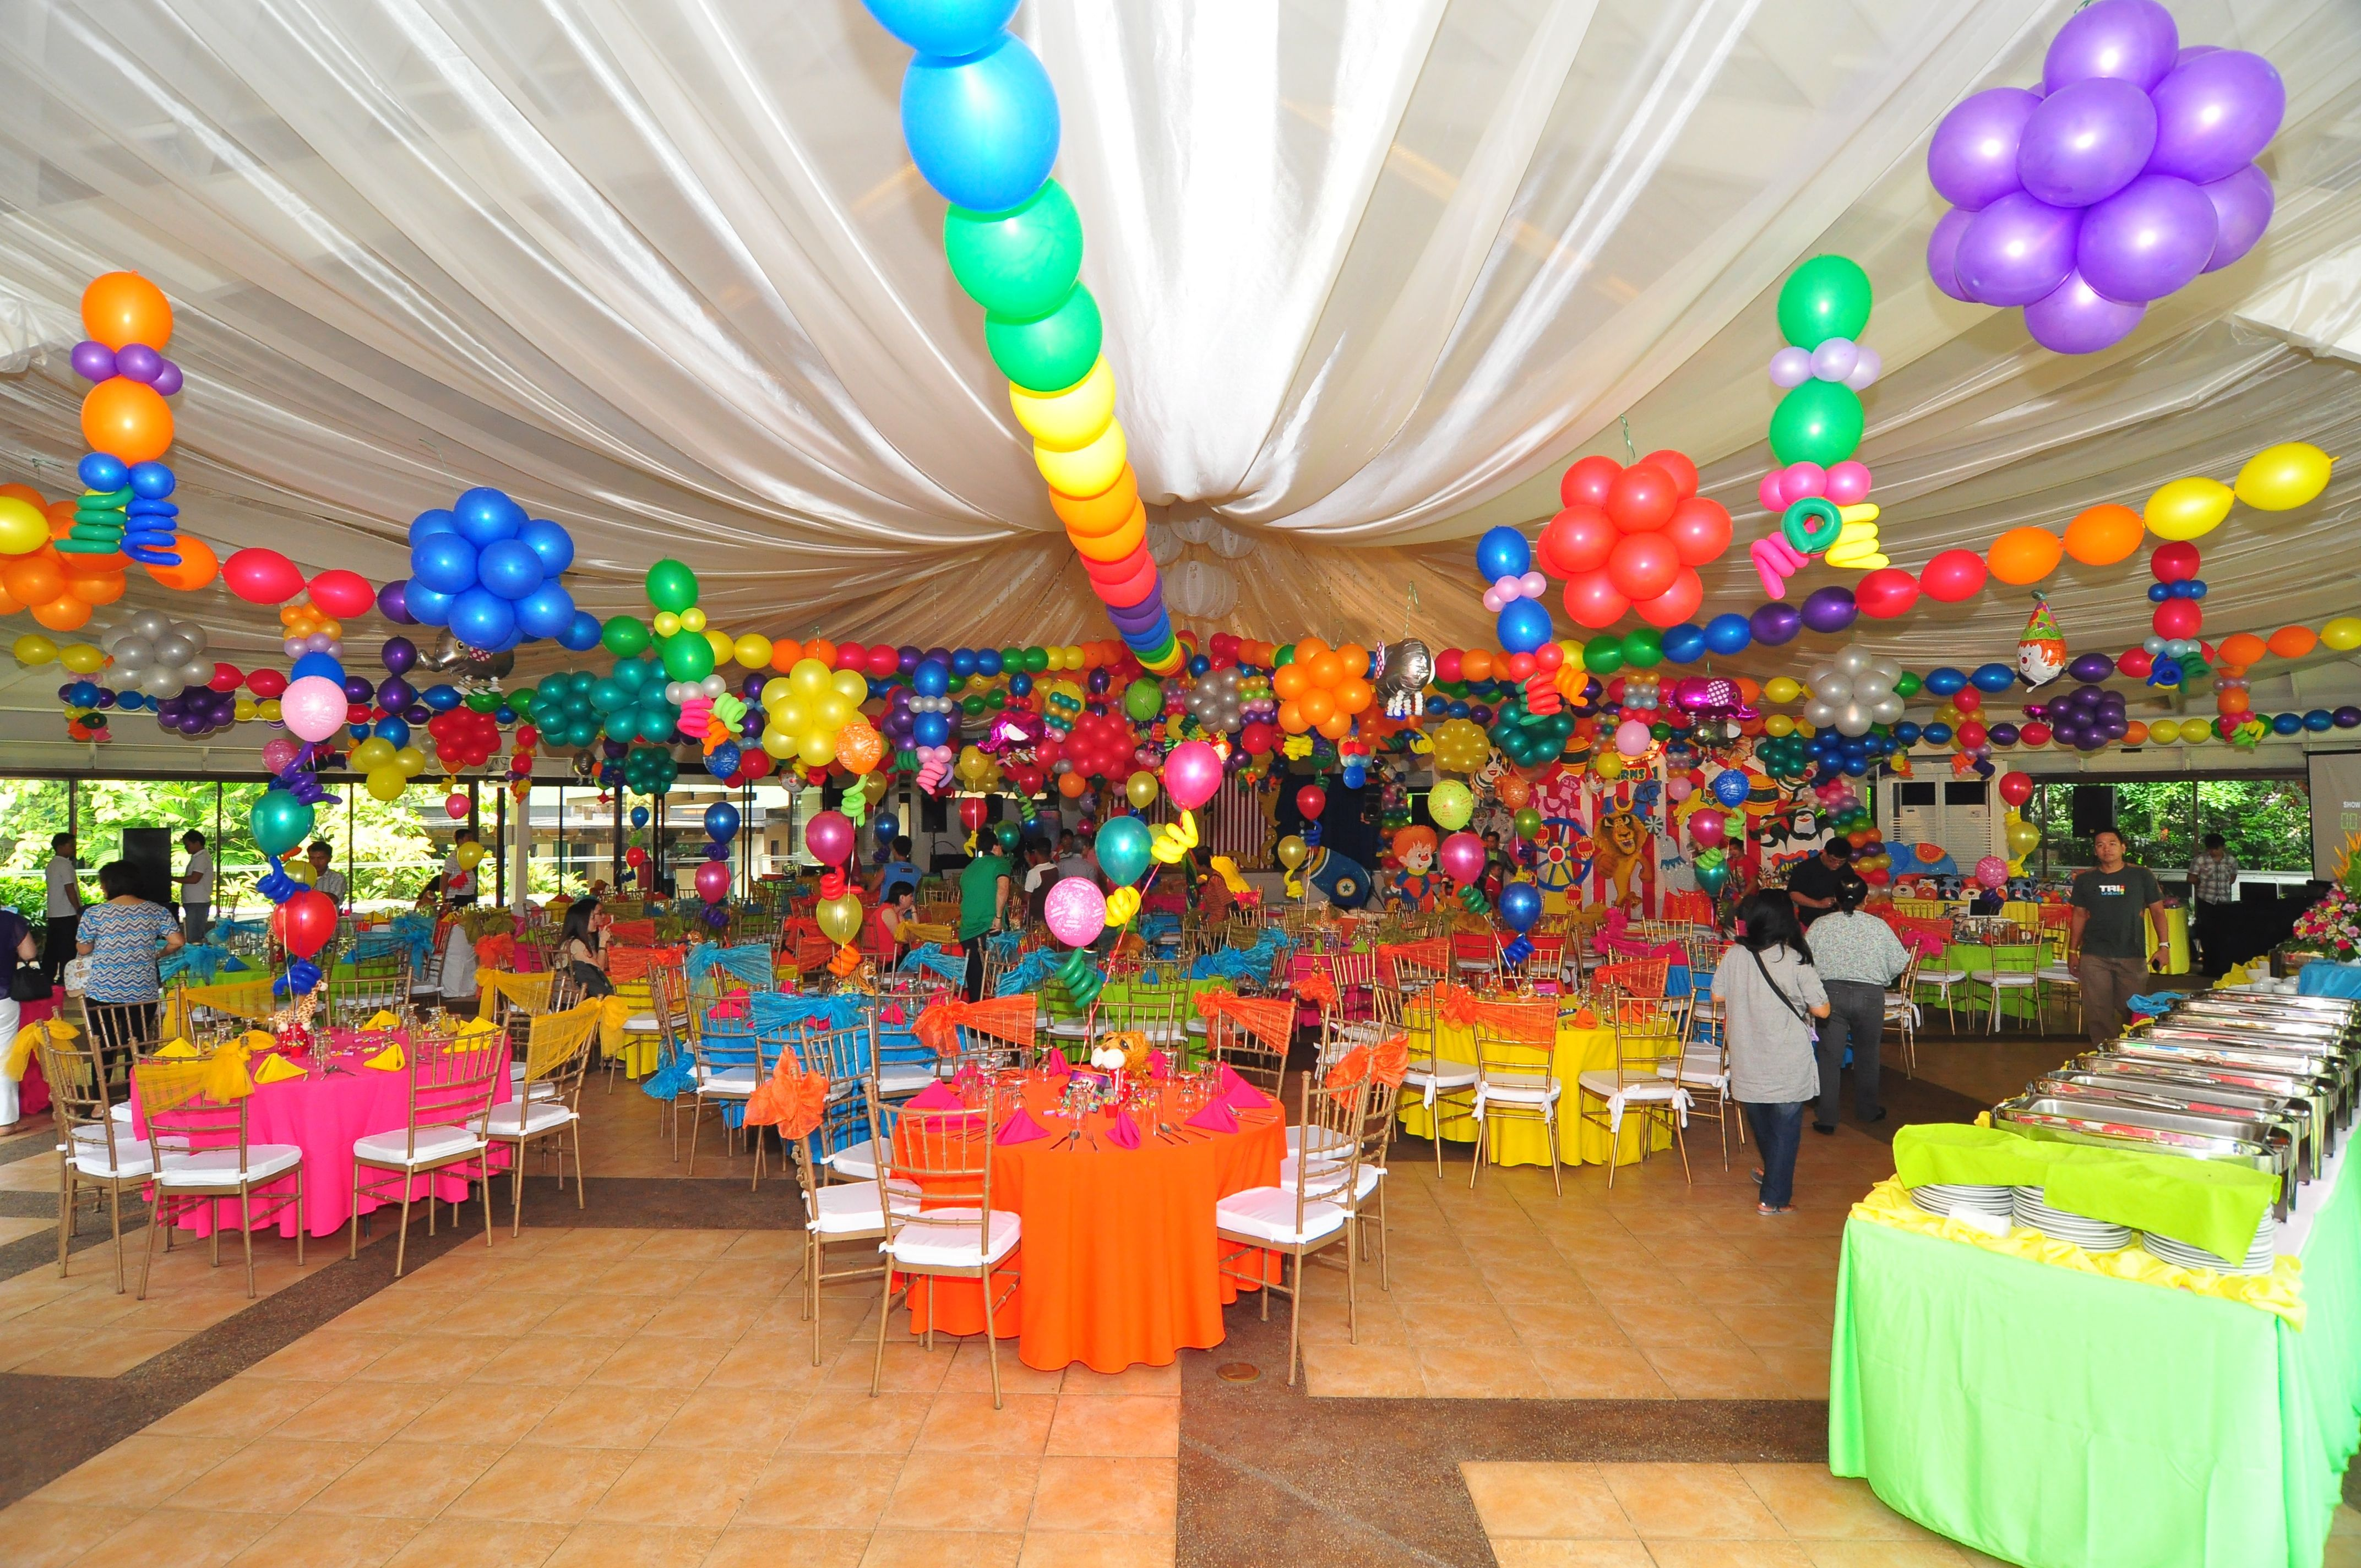 Balloon Setup Carnival Themes 1st Birthday Parties Birthdays Madagascar Balloons